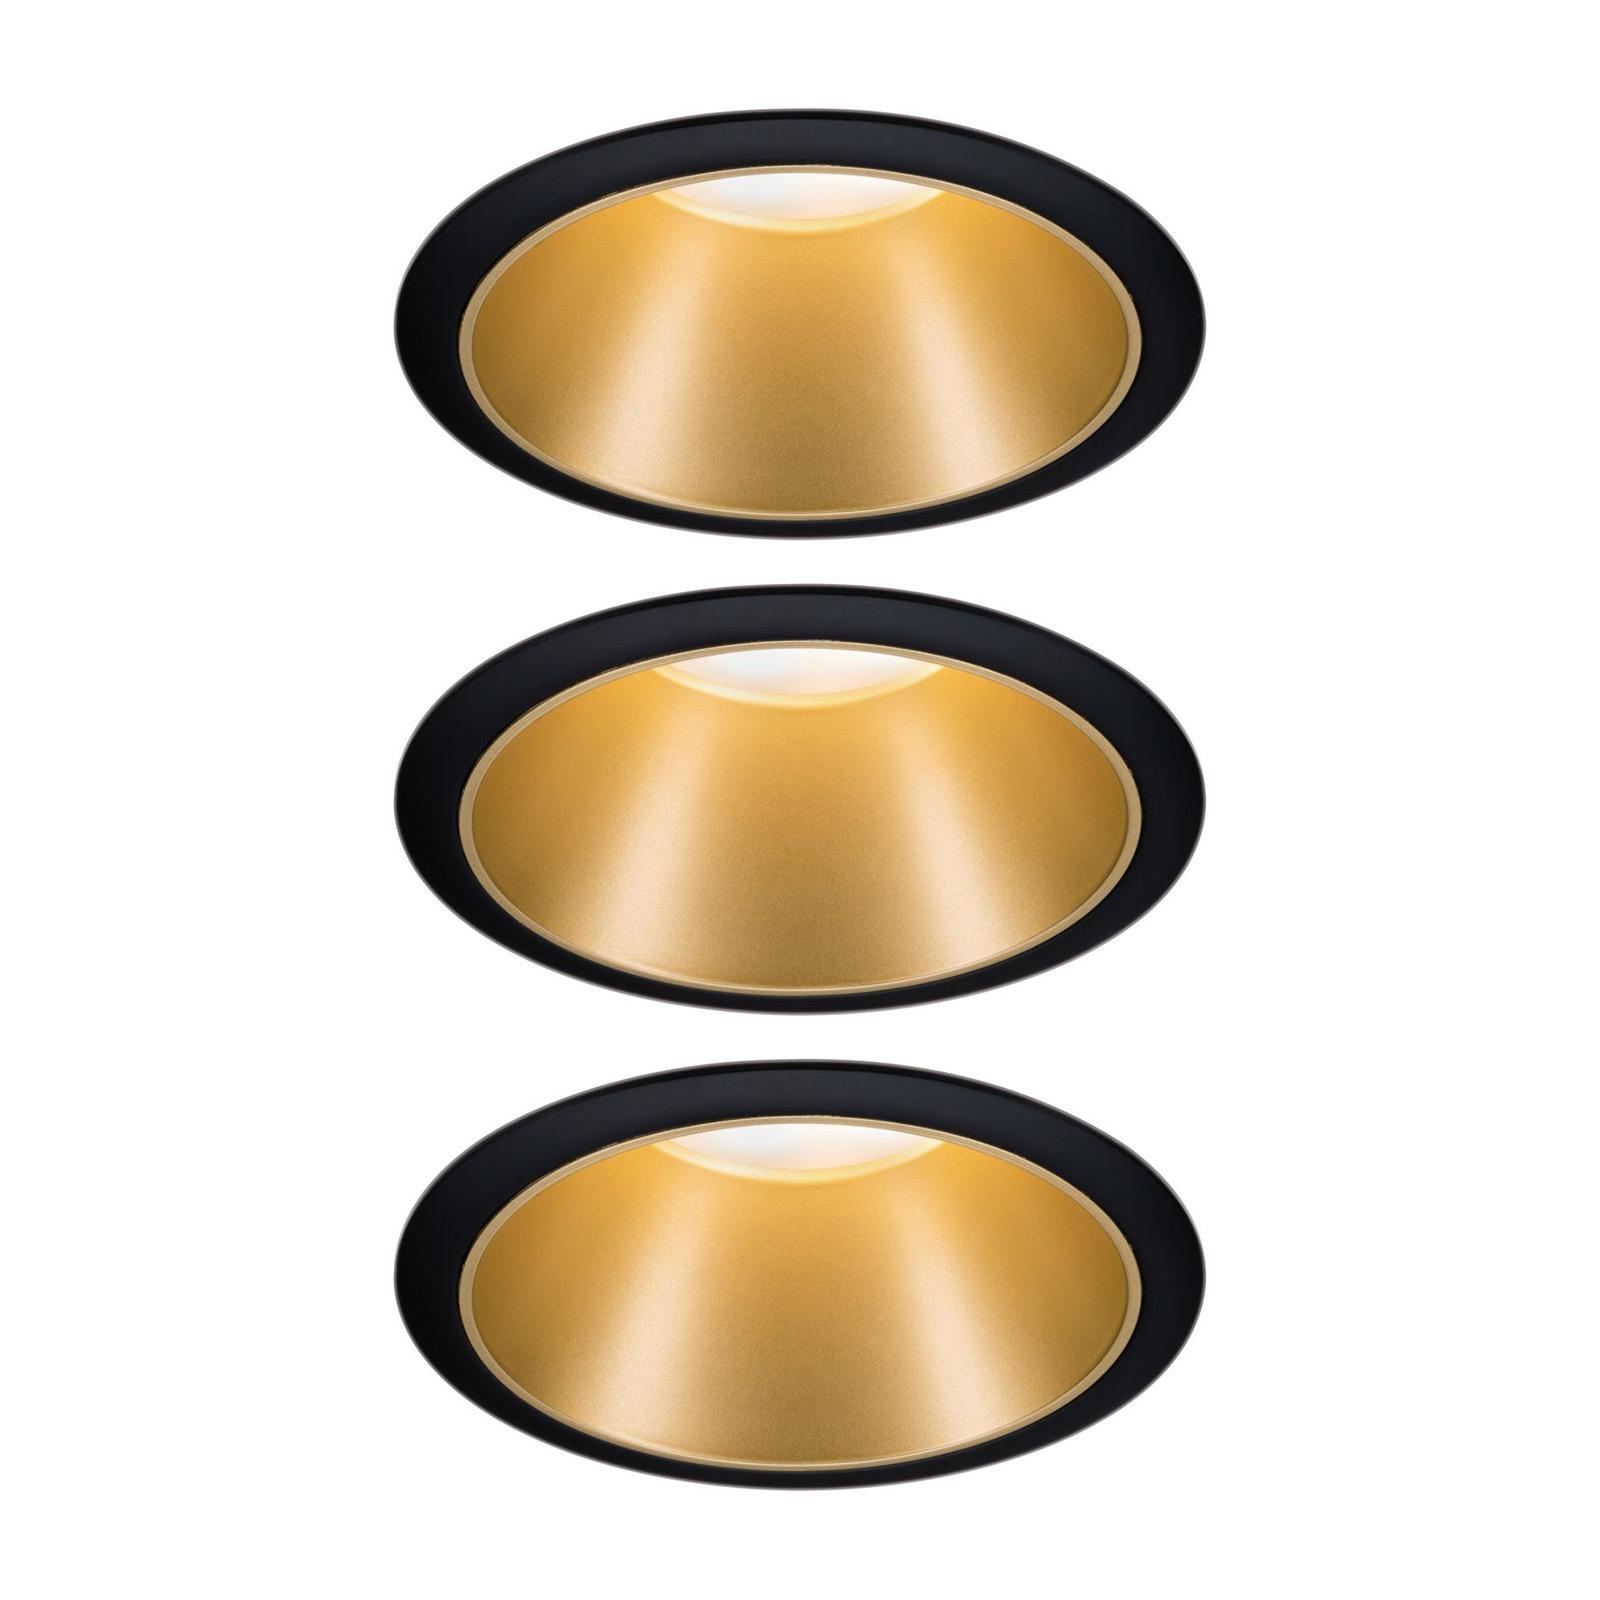 Paulmann Cole LED spotlight, zlato-černý, 3ks